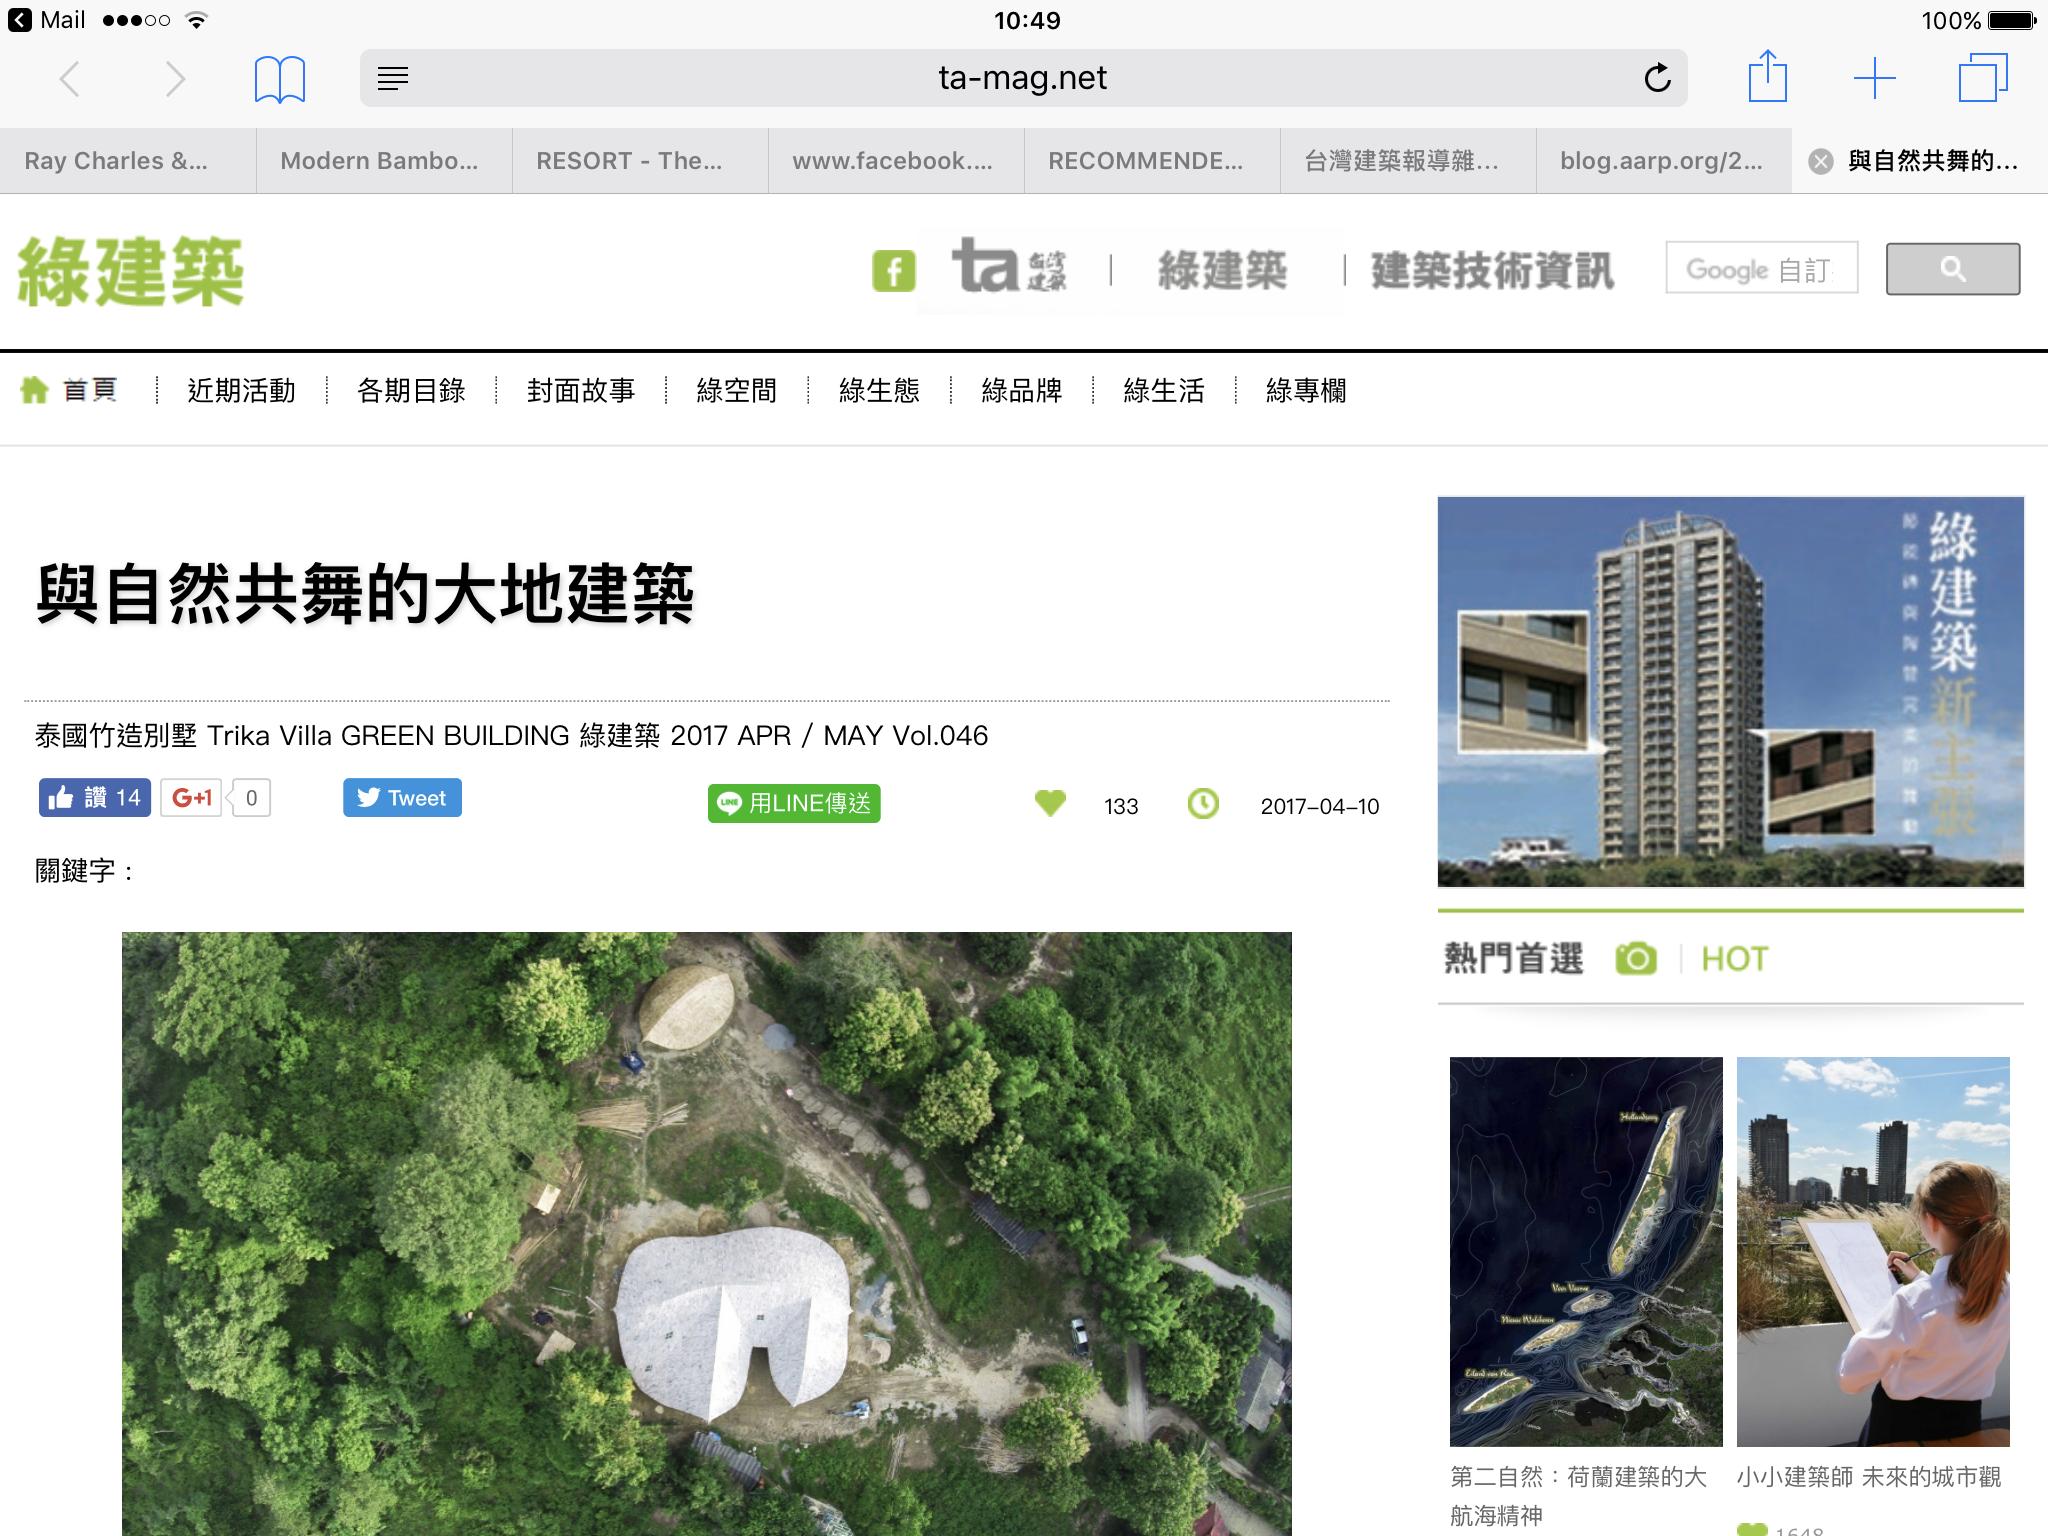 Taiwan Architecture Magazine CLC Bamboo Architecture - Bamboo Earth